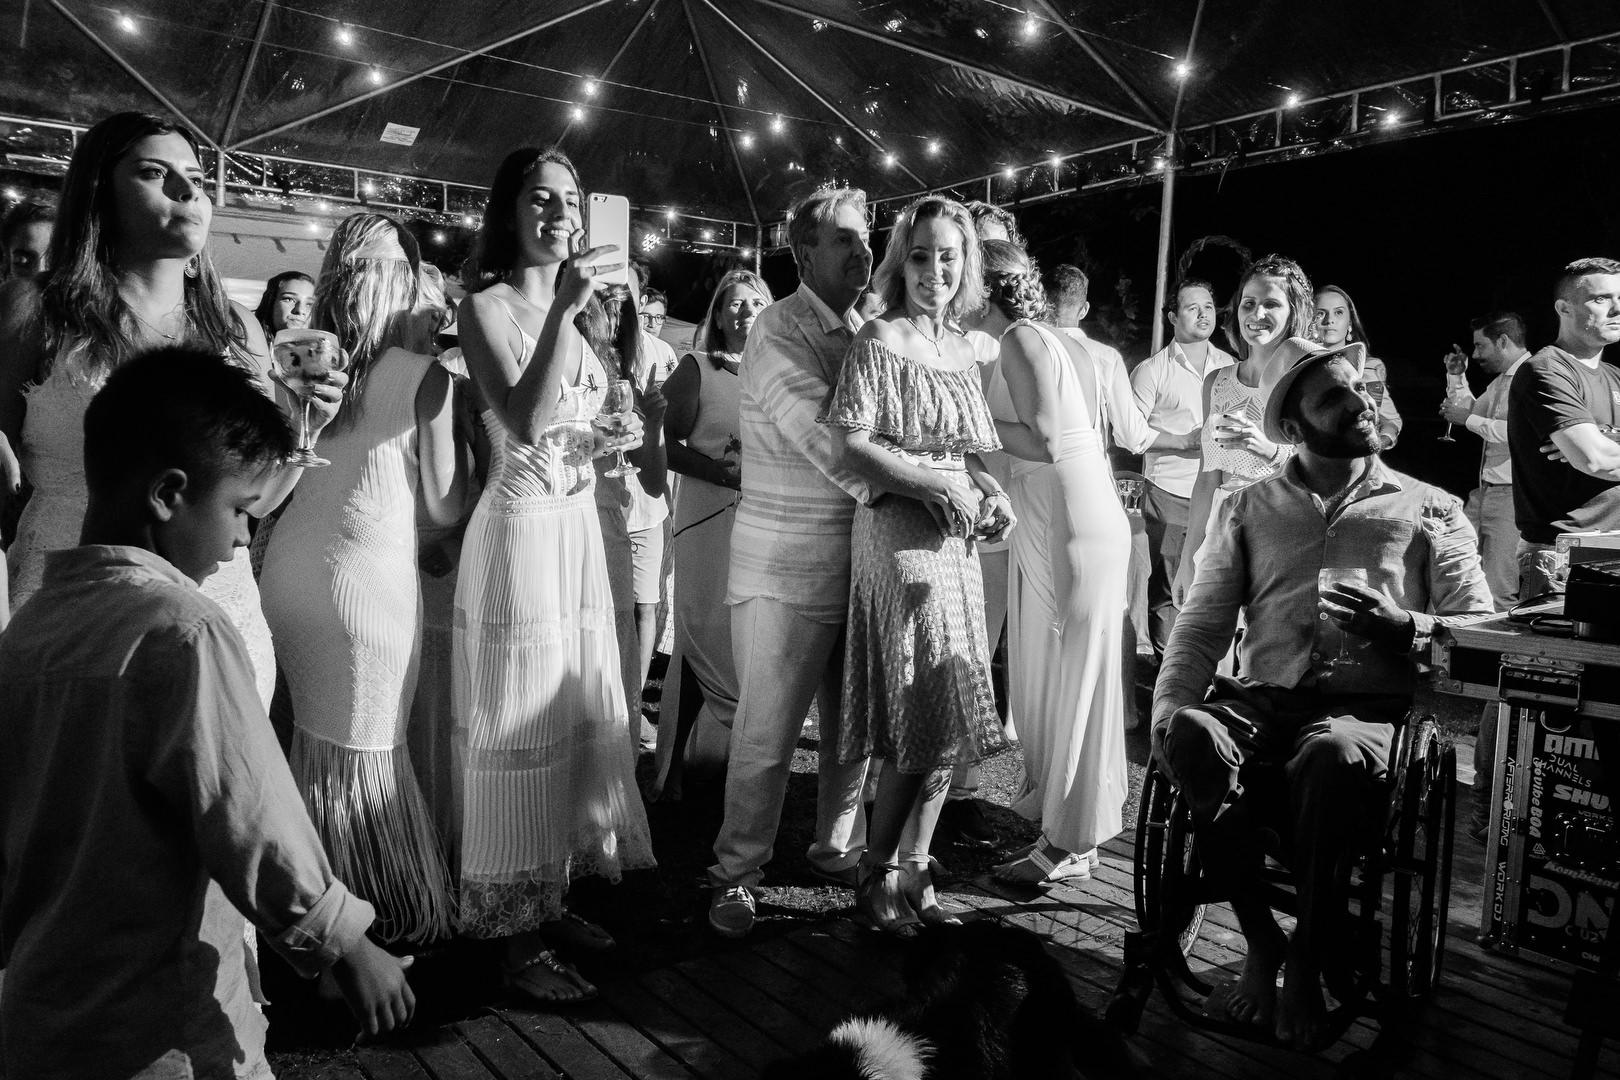 2a Parte do casamento mais doido do ano... Casamento Destination Wedding  loucura no casamento casando na praia casamento no hostel casamento no albergue casamento na barra da lagoa casamento louco casamento doido